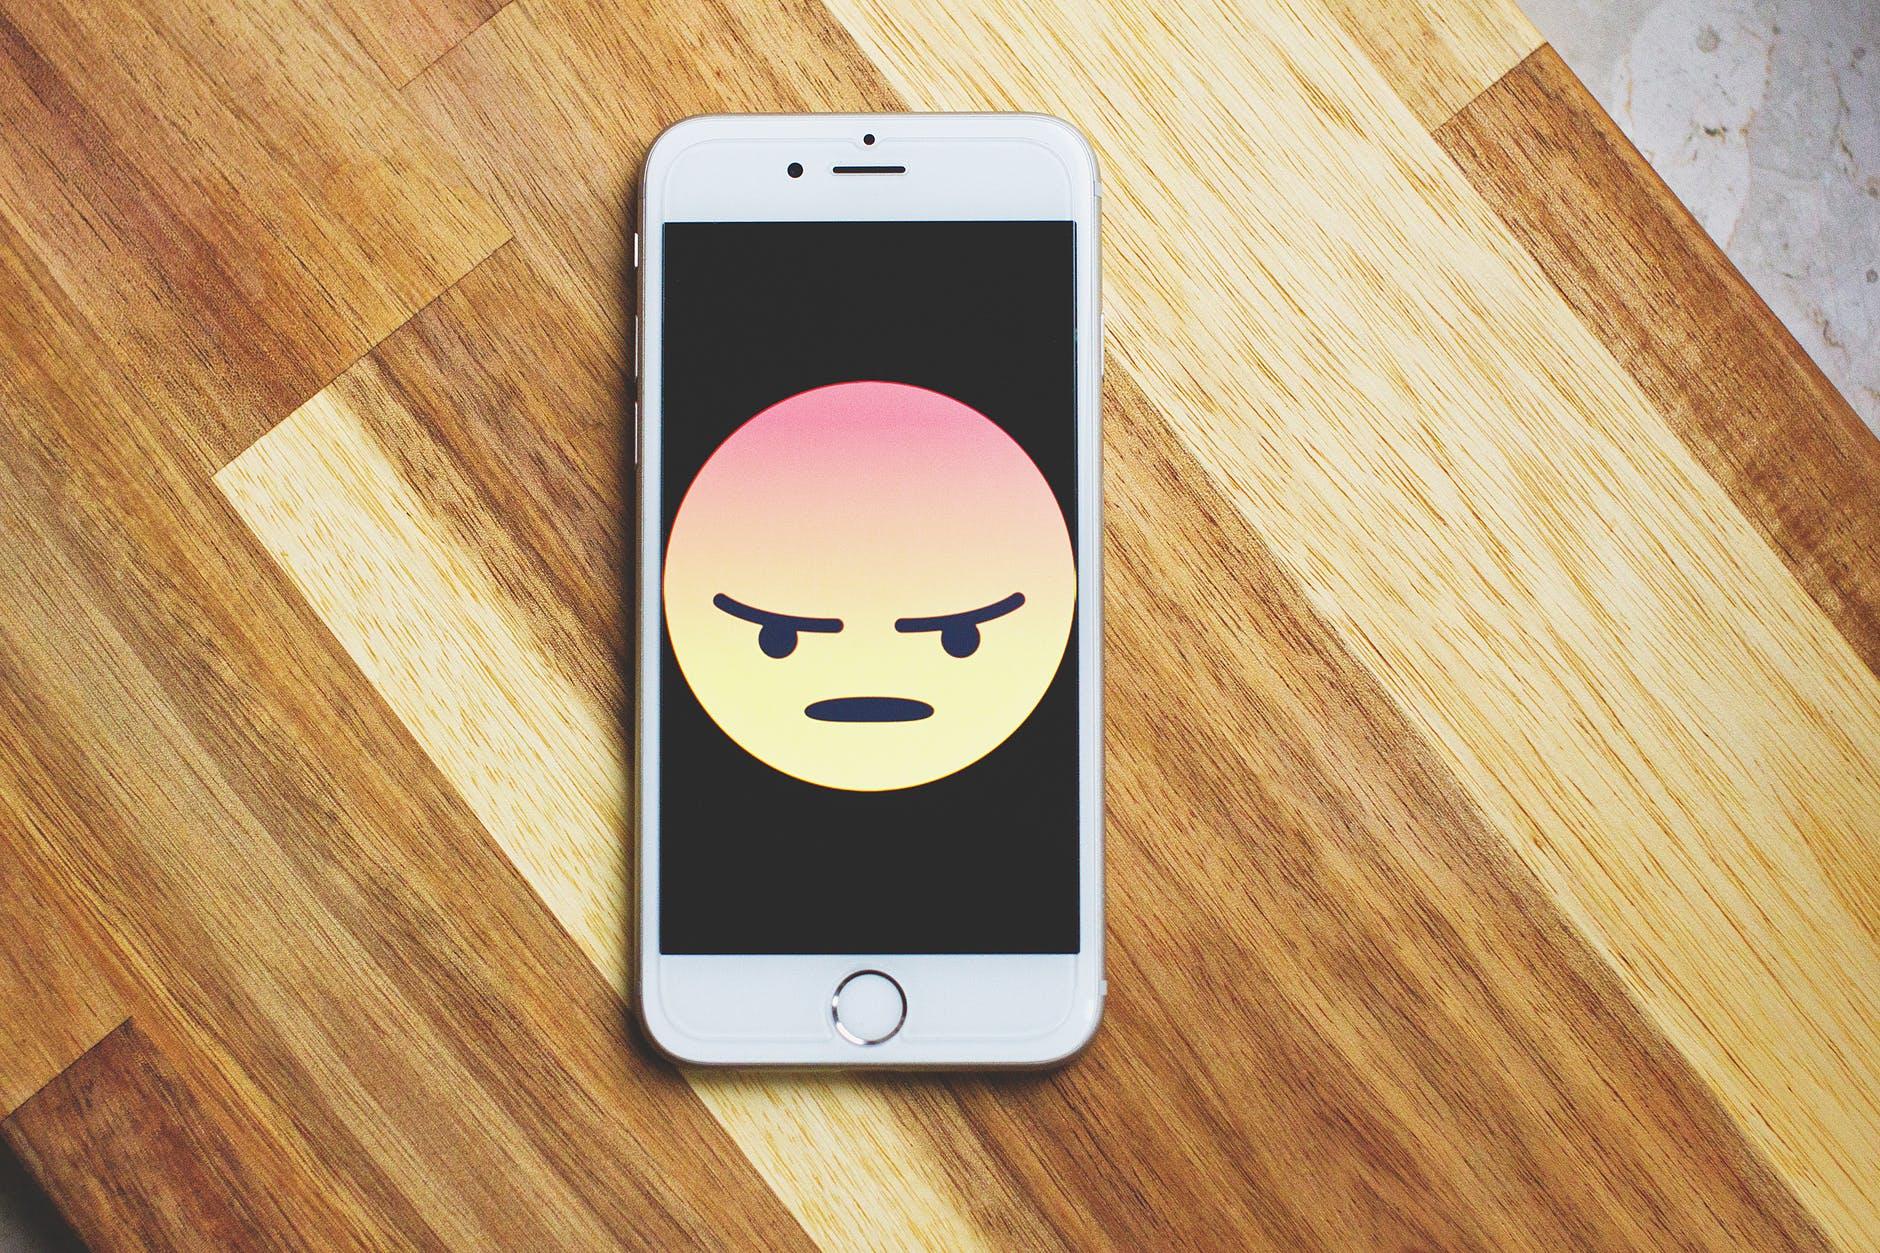 Image of emoji on phone